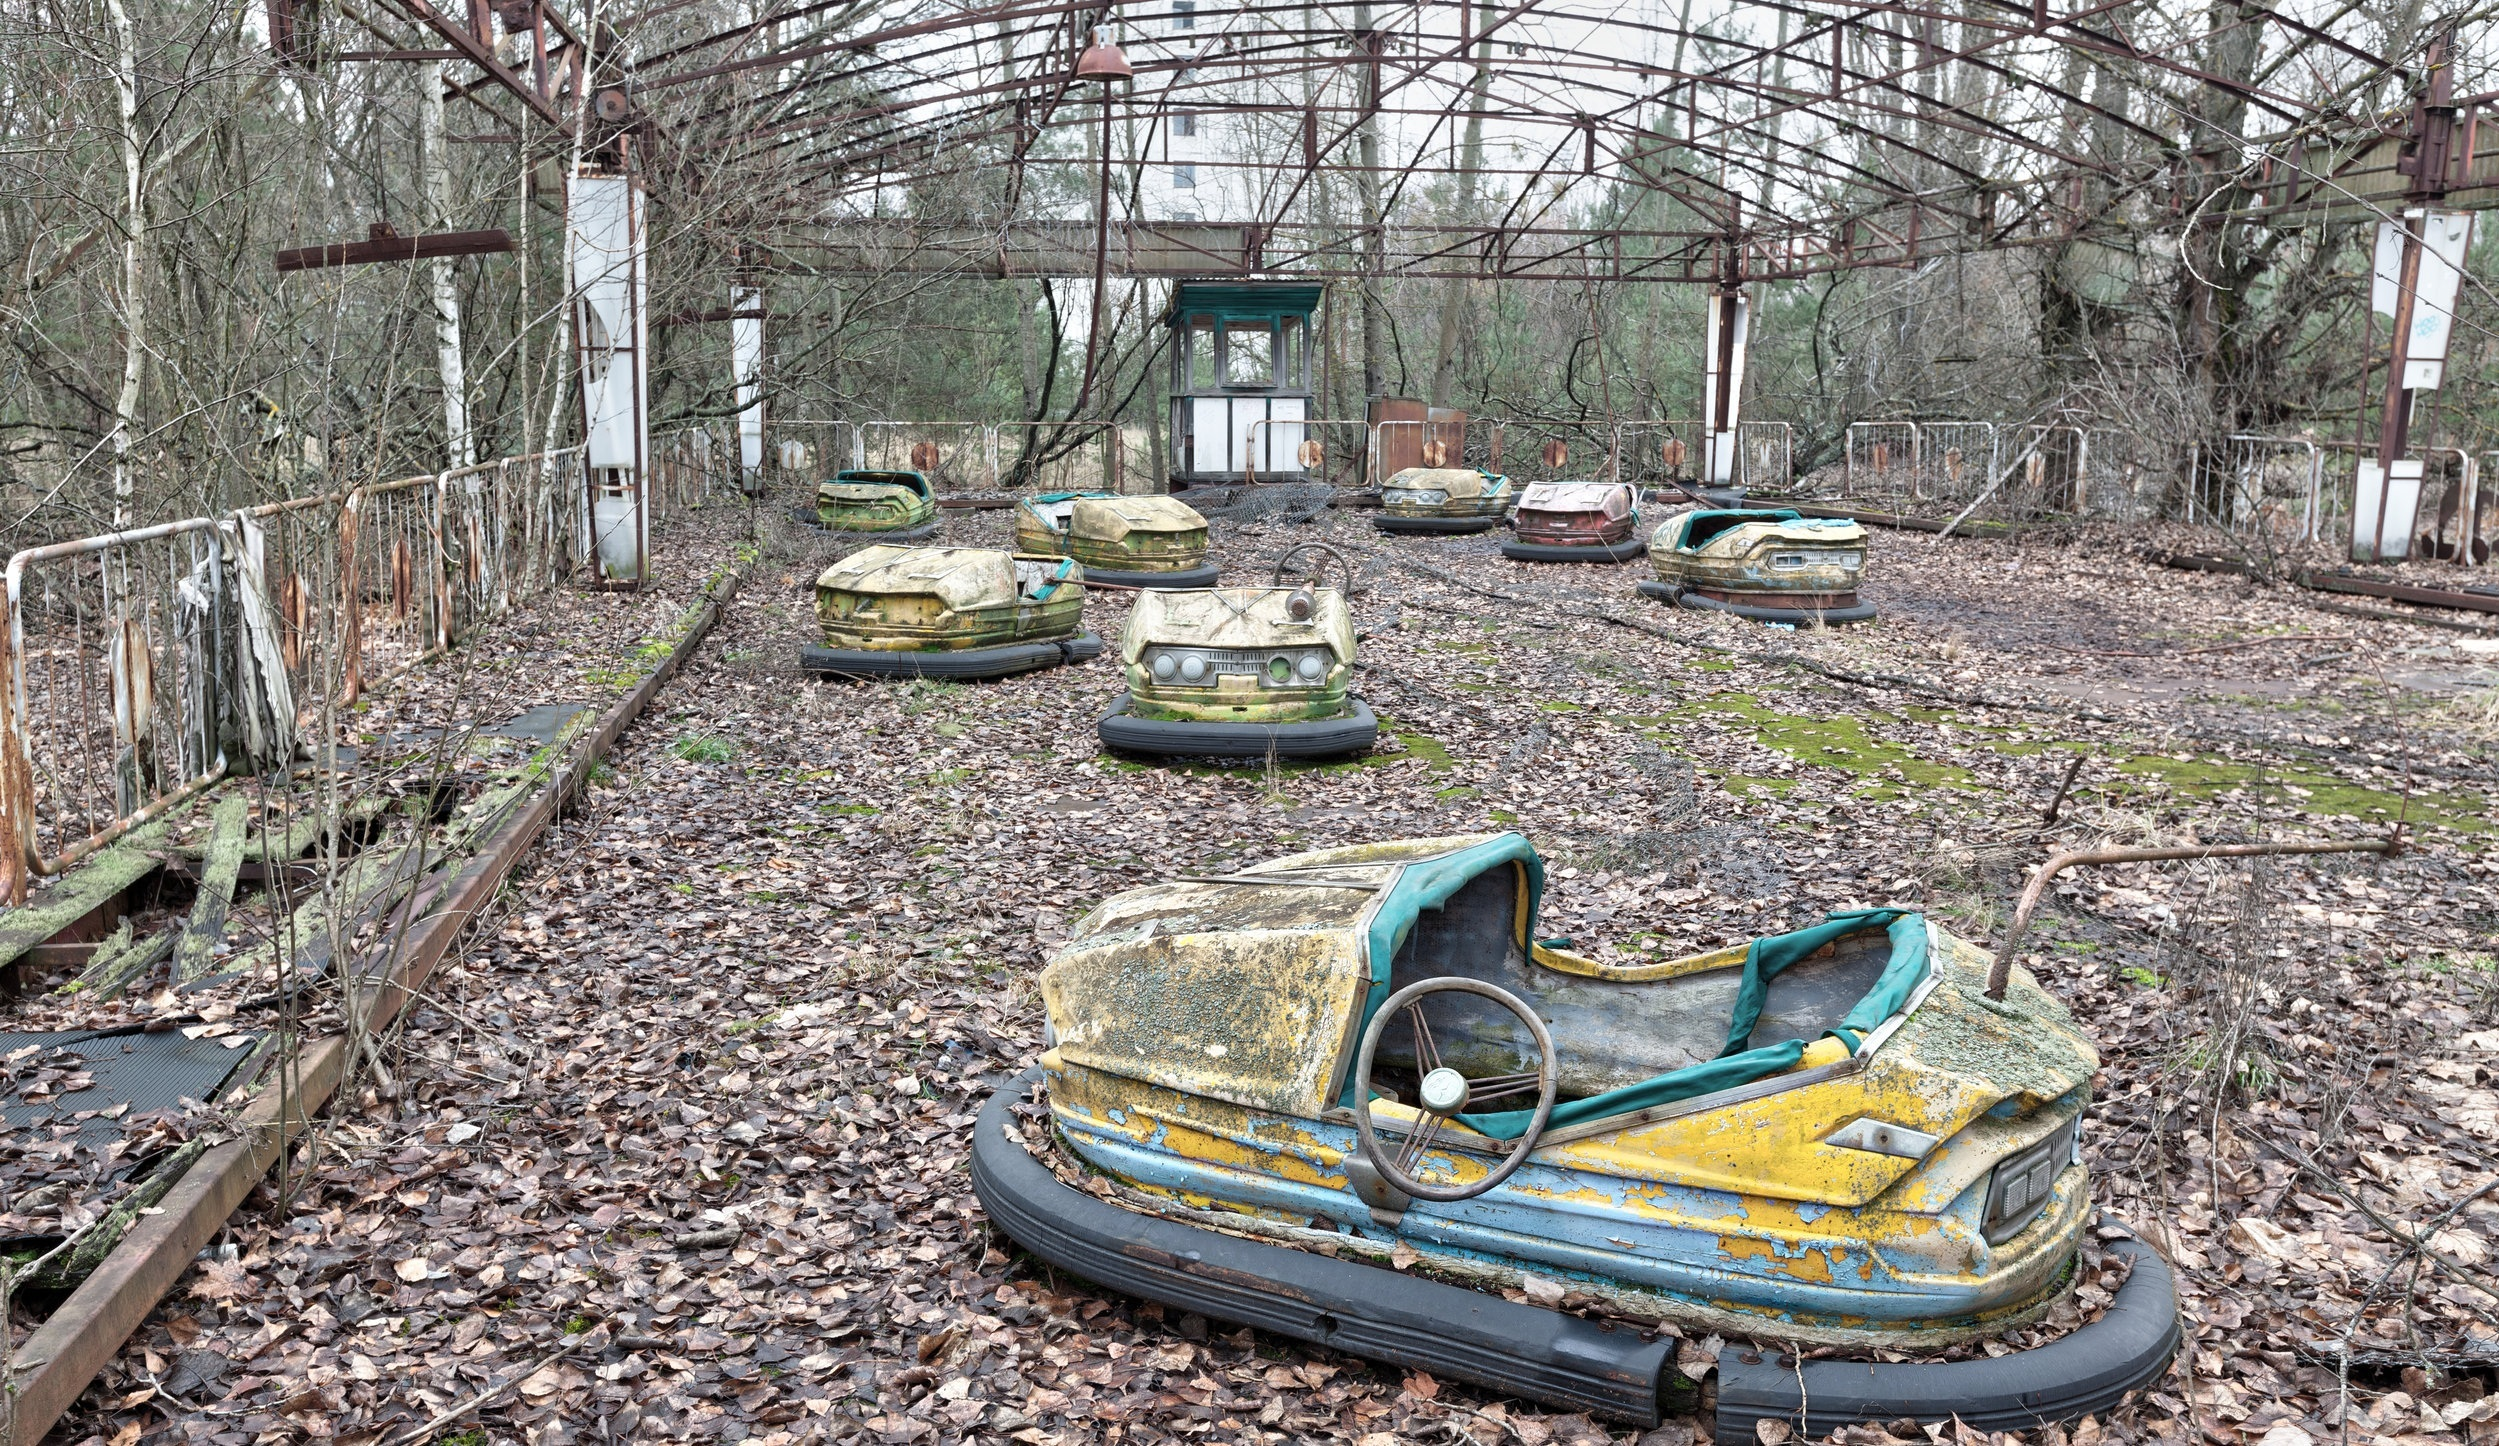 attraction-in-amusement-park-in-overgrown-ghost-PW8VQUD.jpg